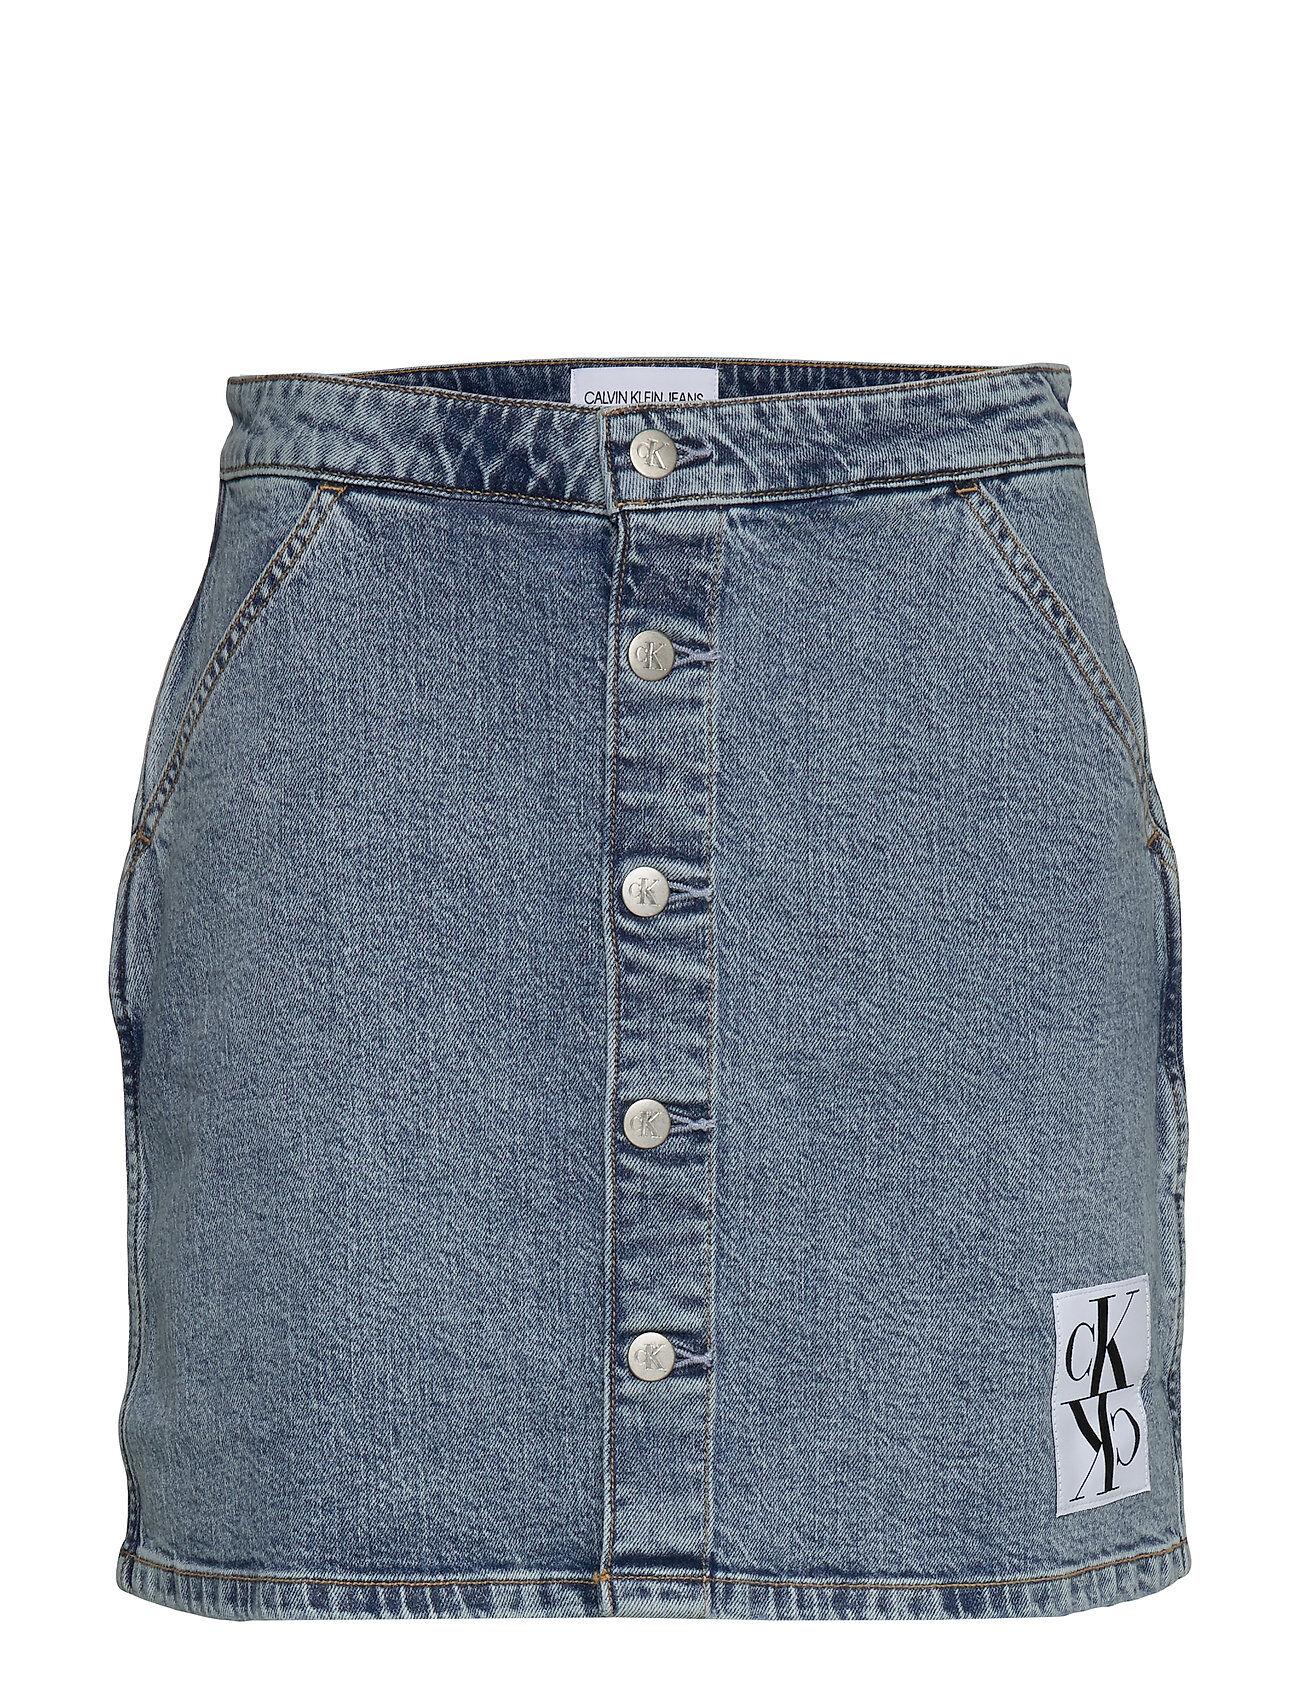 Image of Calvin Button Down Utility Skirt Lyhyt Hame Sininen Calvin Klein Jeans